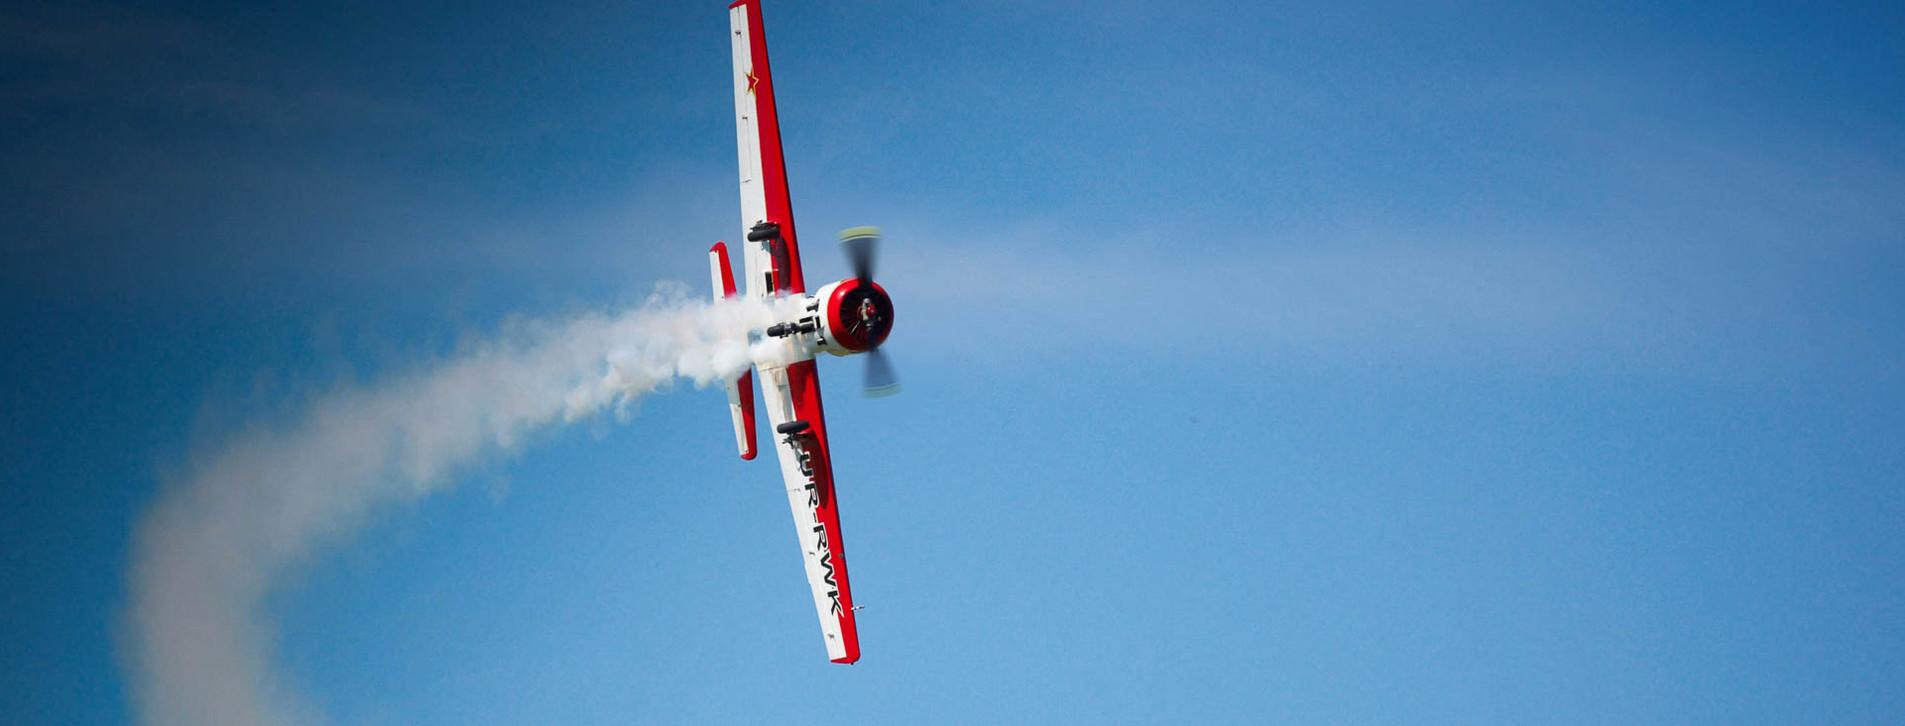 Фото 1 - Фигуры высшего пилотажа на ЯК-52